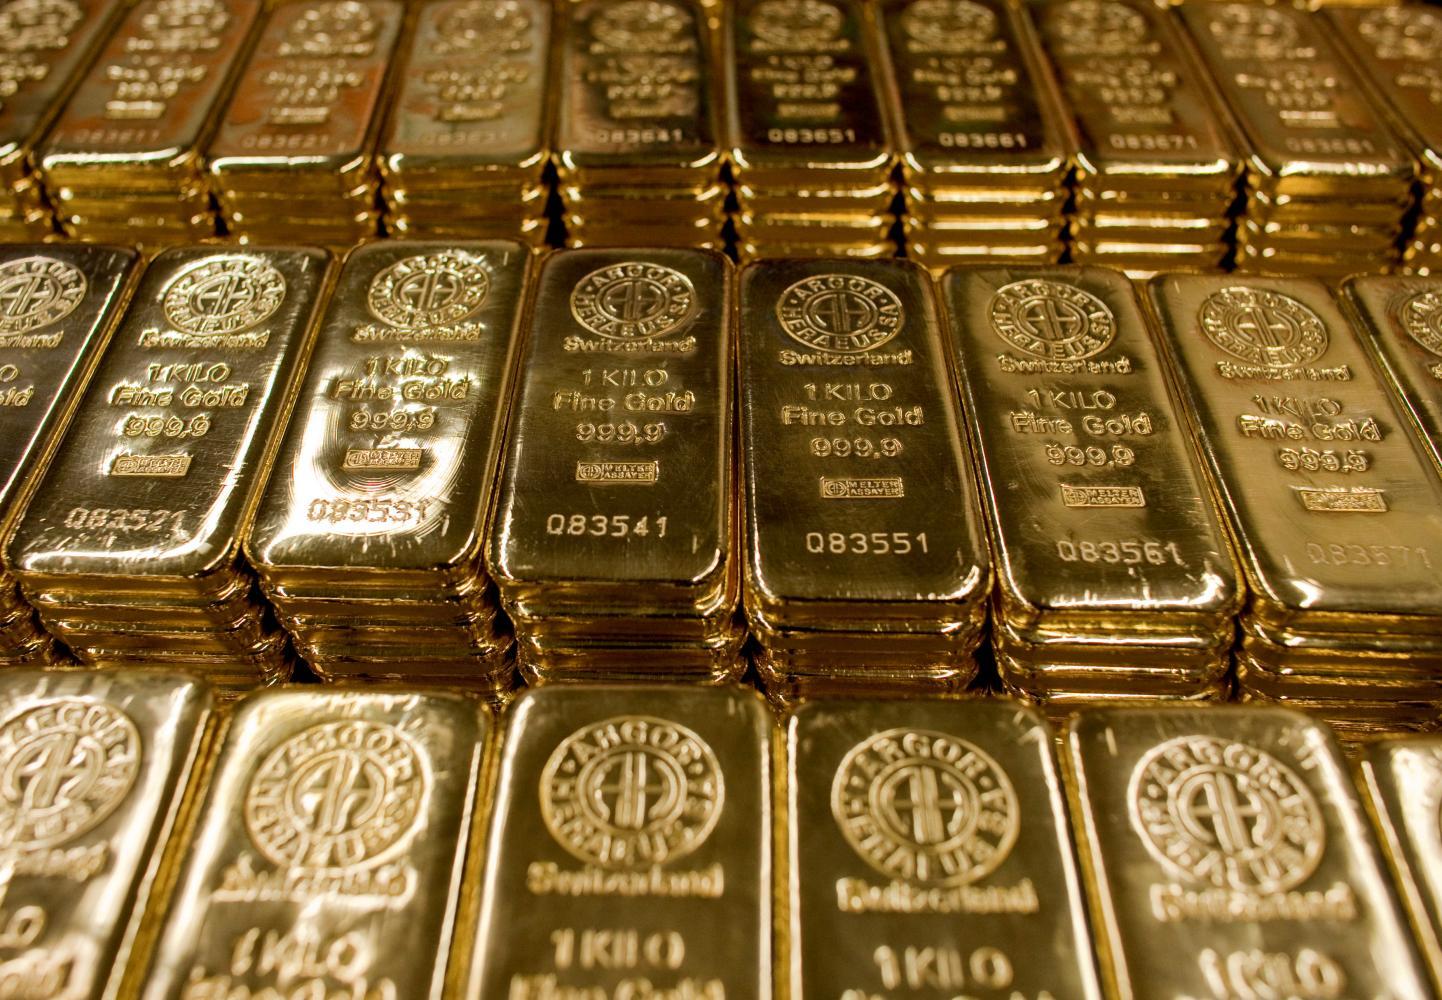 3349064 - Весна 2020: настоящая драма на рынке золота